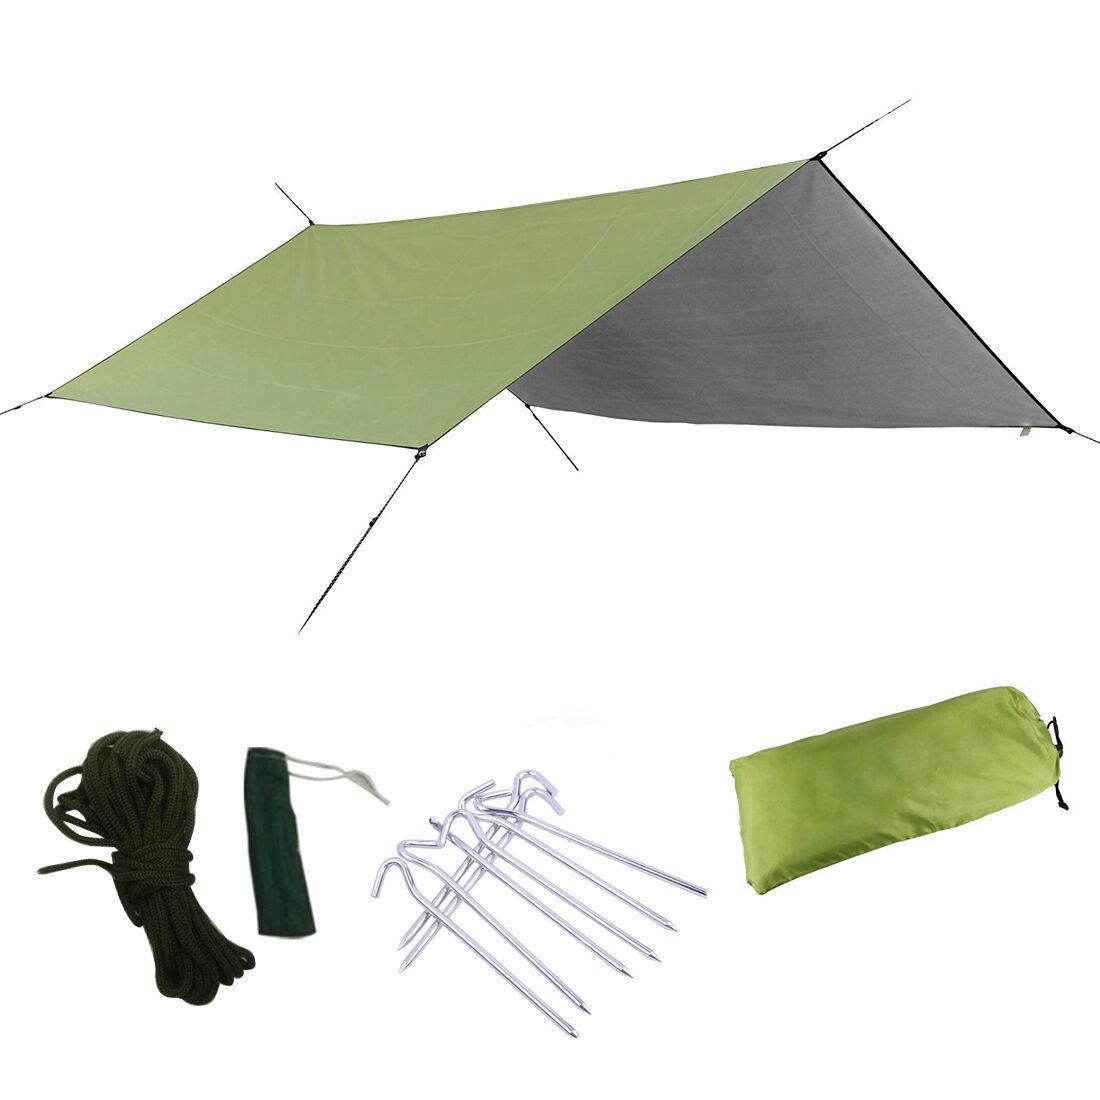 Portable Camping Tent Tarp Shelter Mat